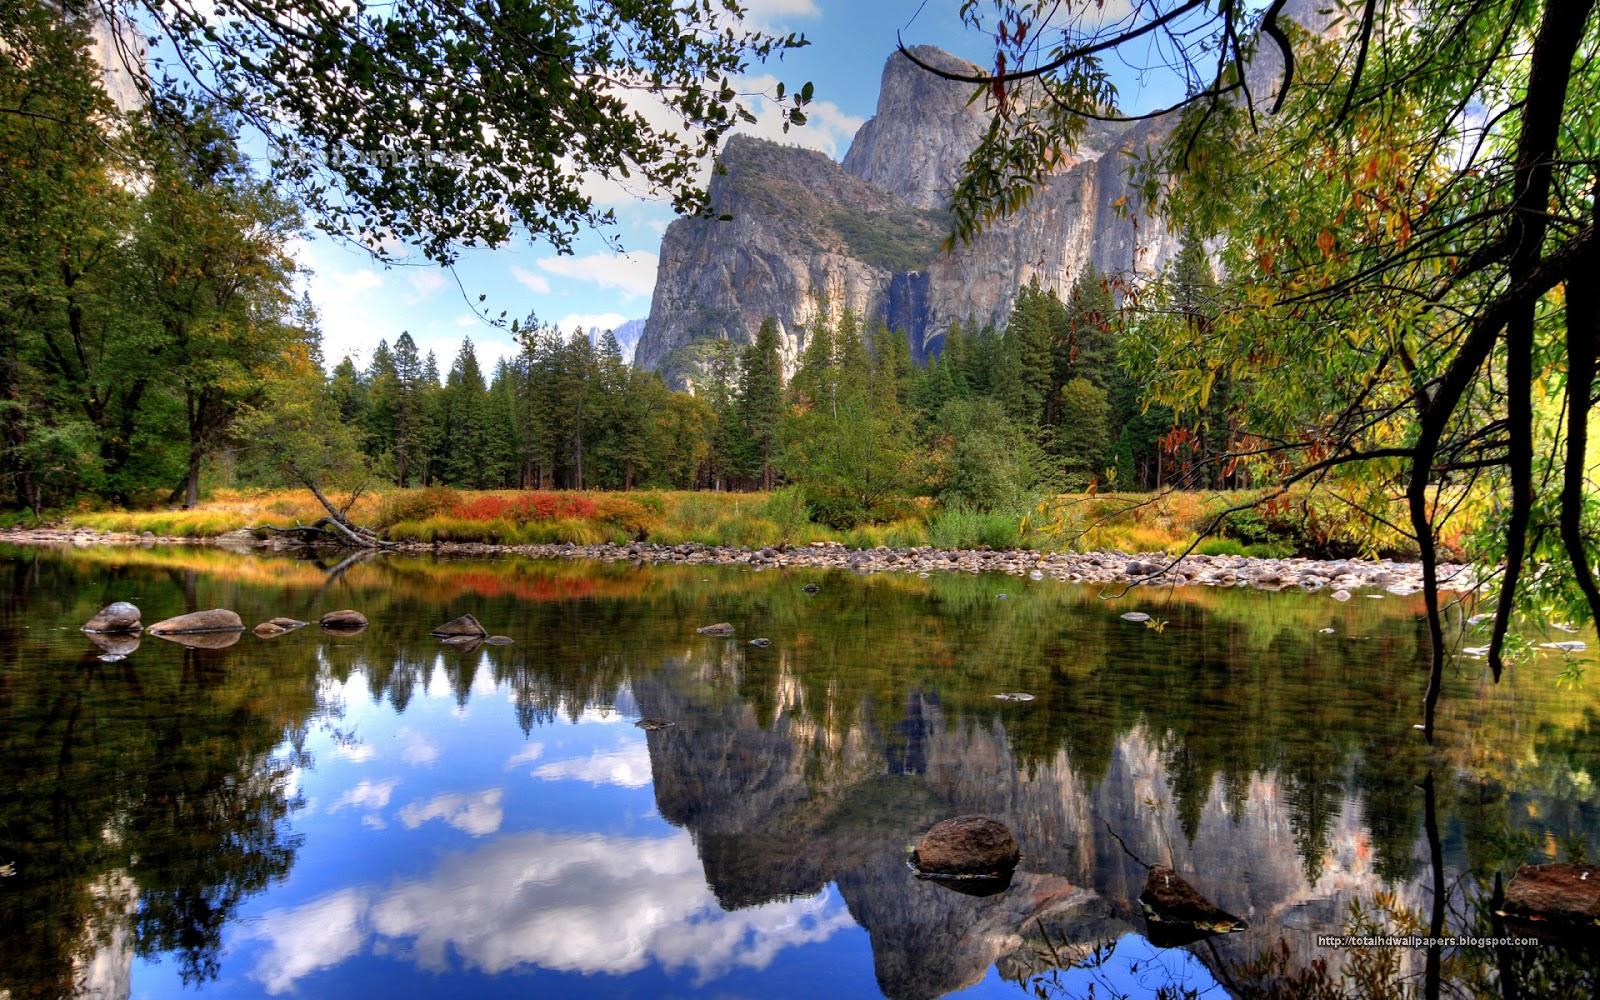 Imagenes Hd 1080p: Beautiful Valley Hd Wallpapers